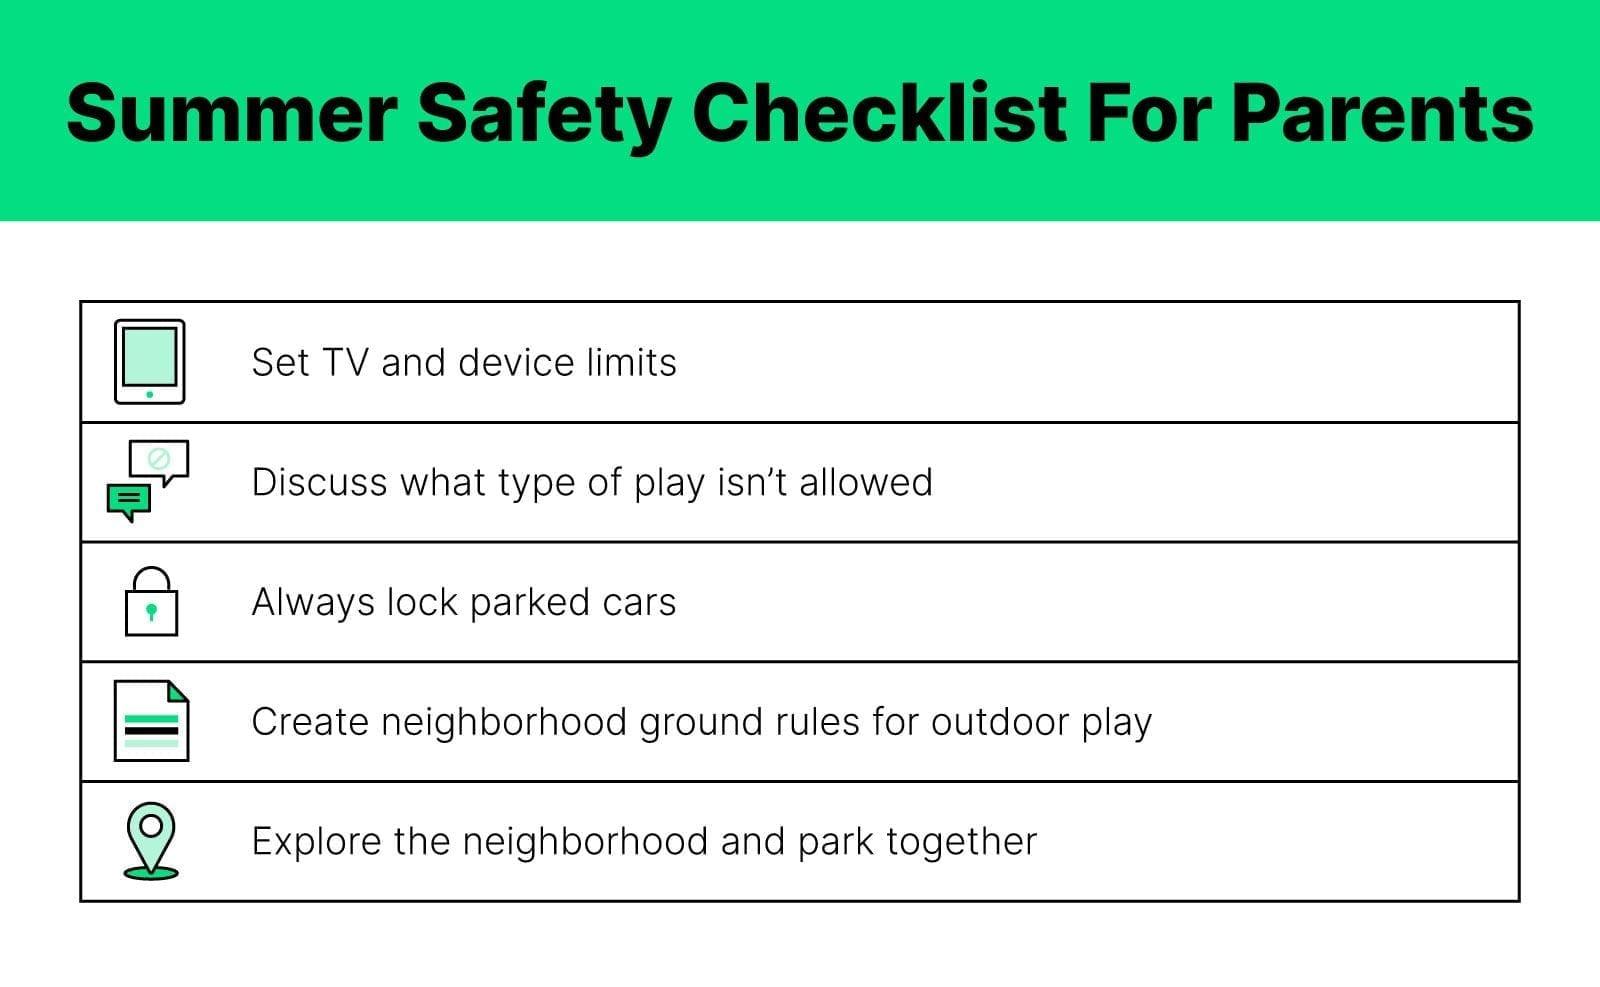 Summer Checklist for Parents